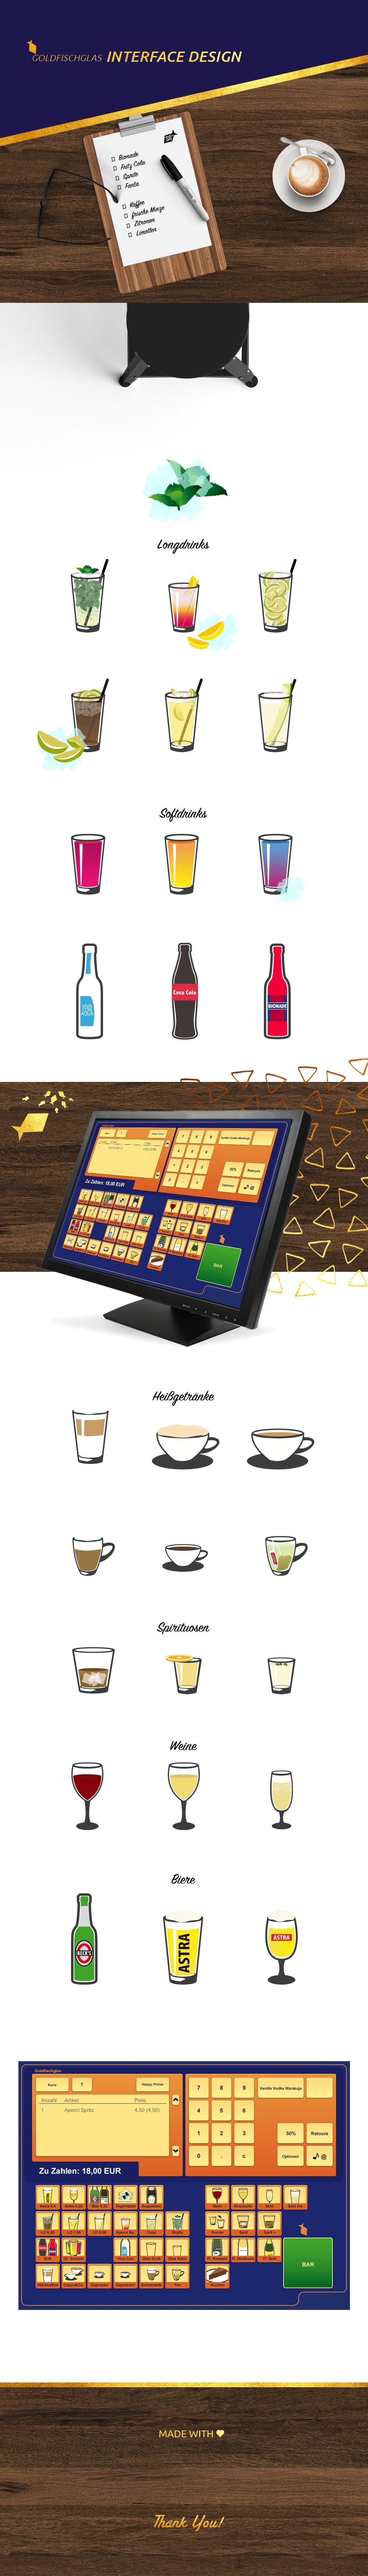 Interface UI Kassensystem